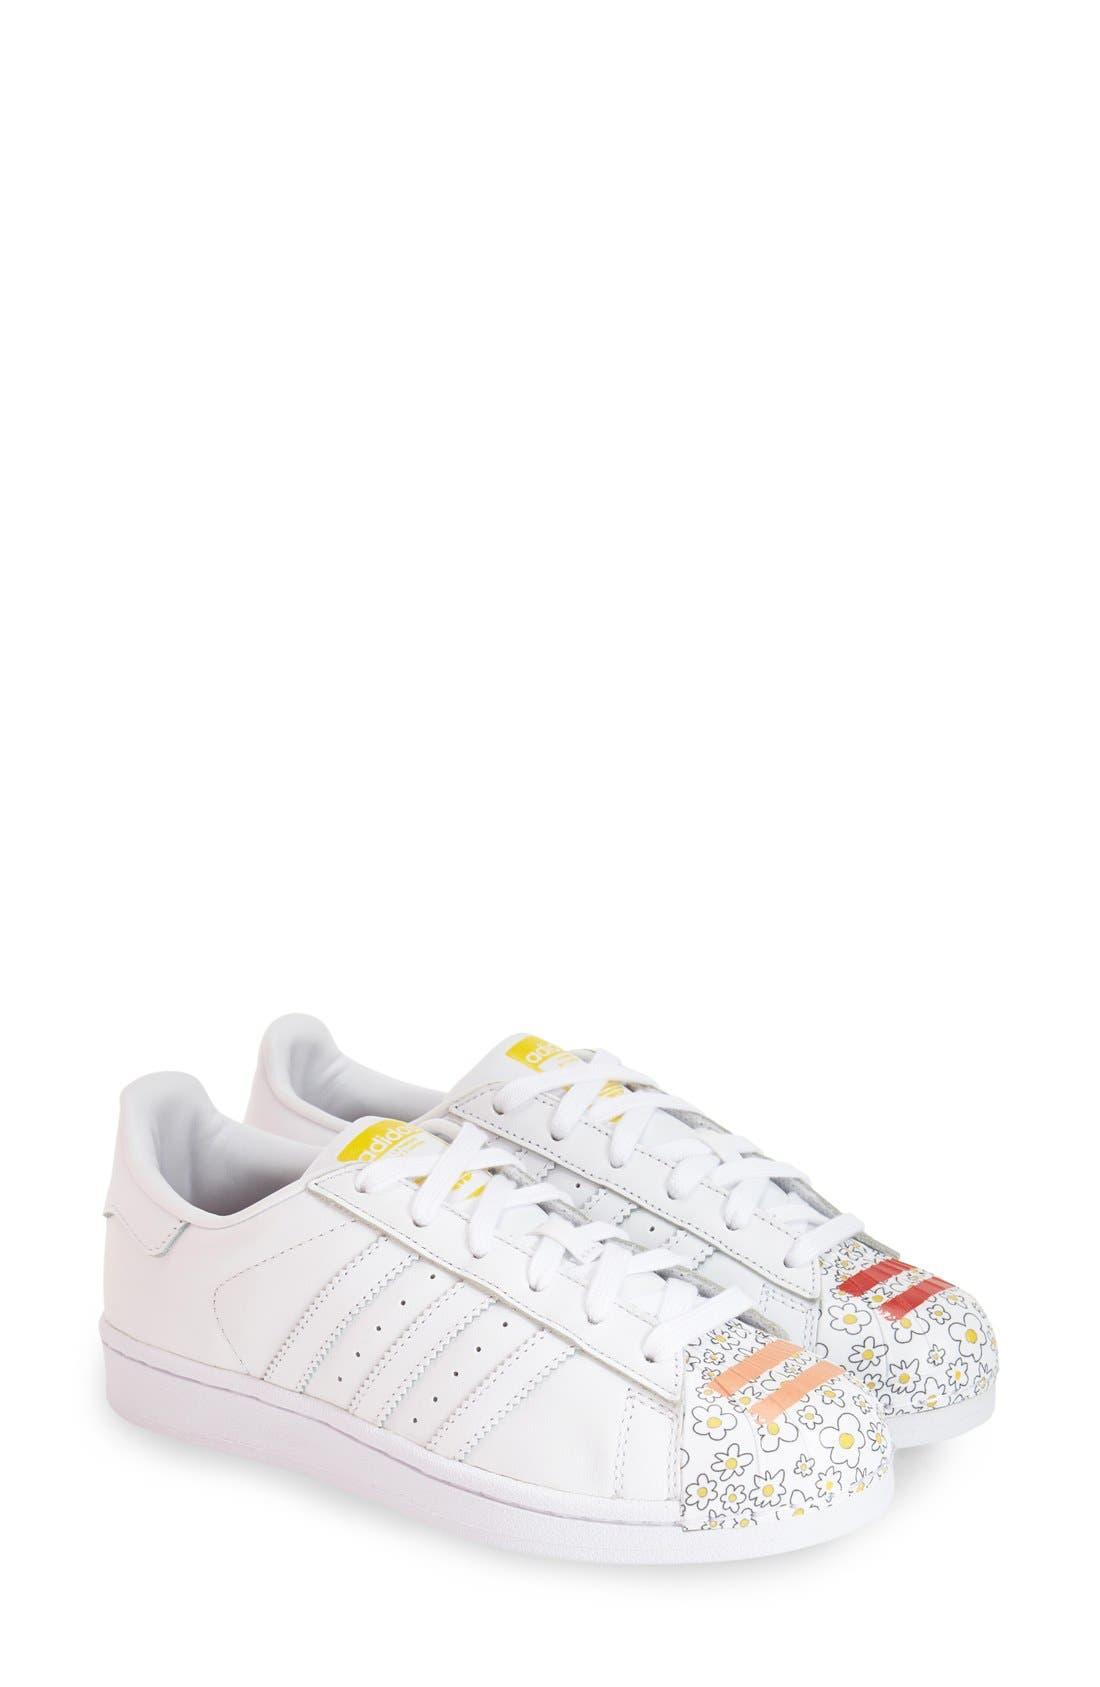 Alternate Image 1 Selected - adidas 'Superstar Pharrell Supershell' Sneaker